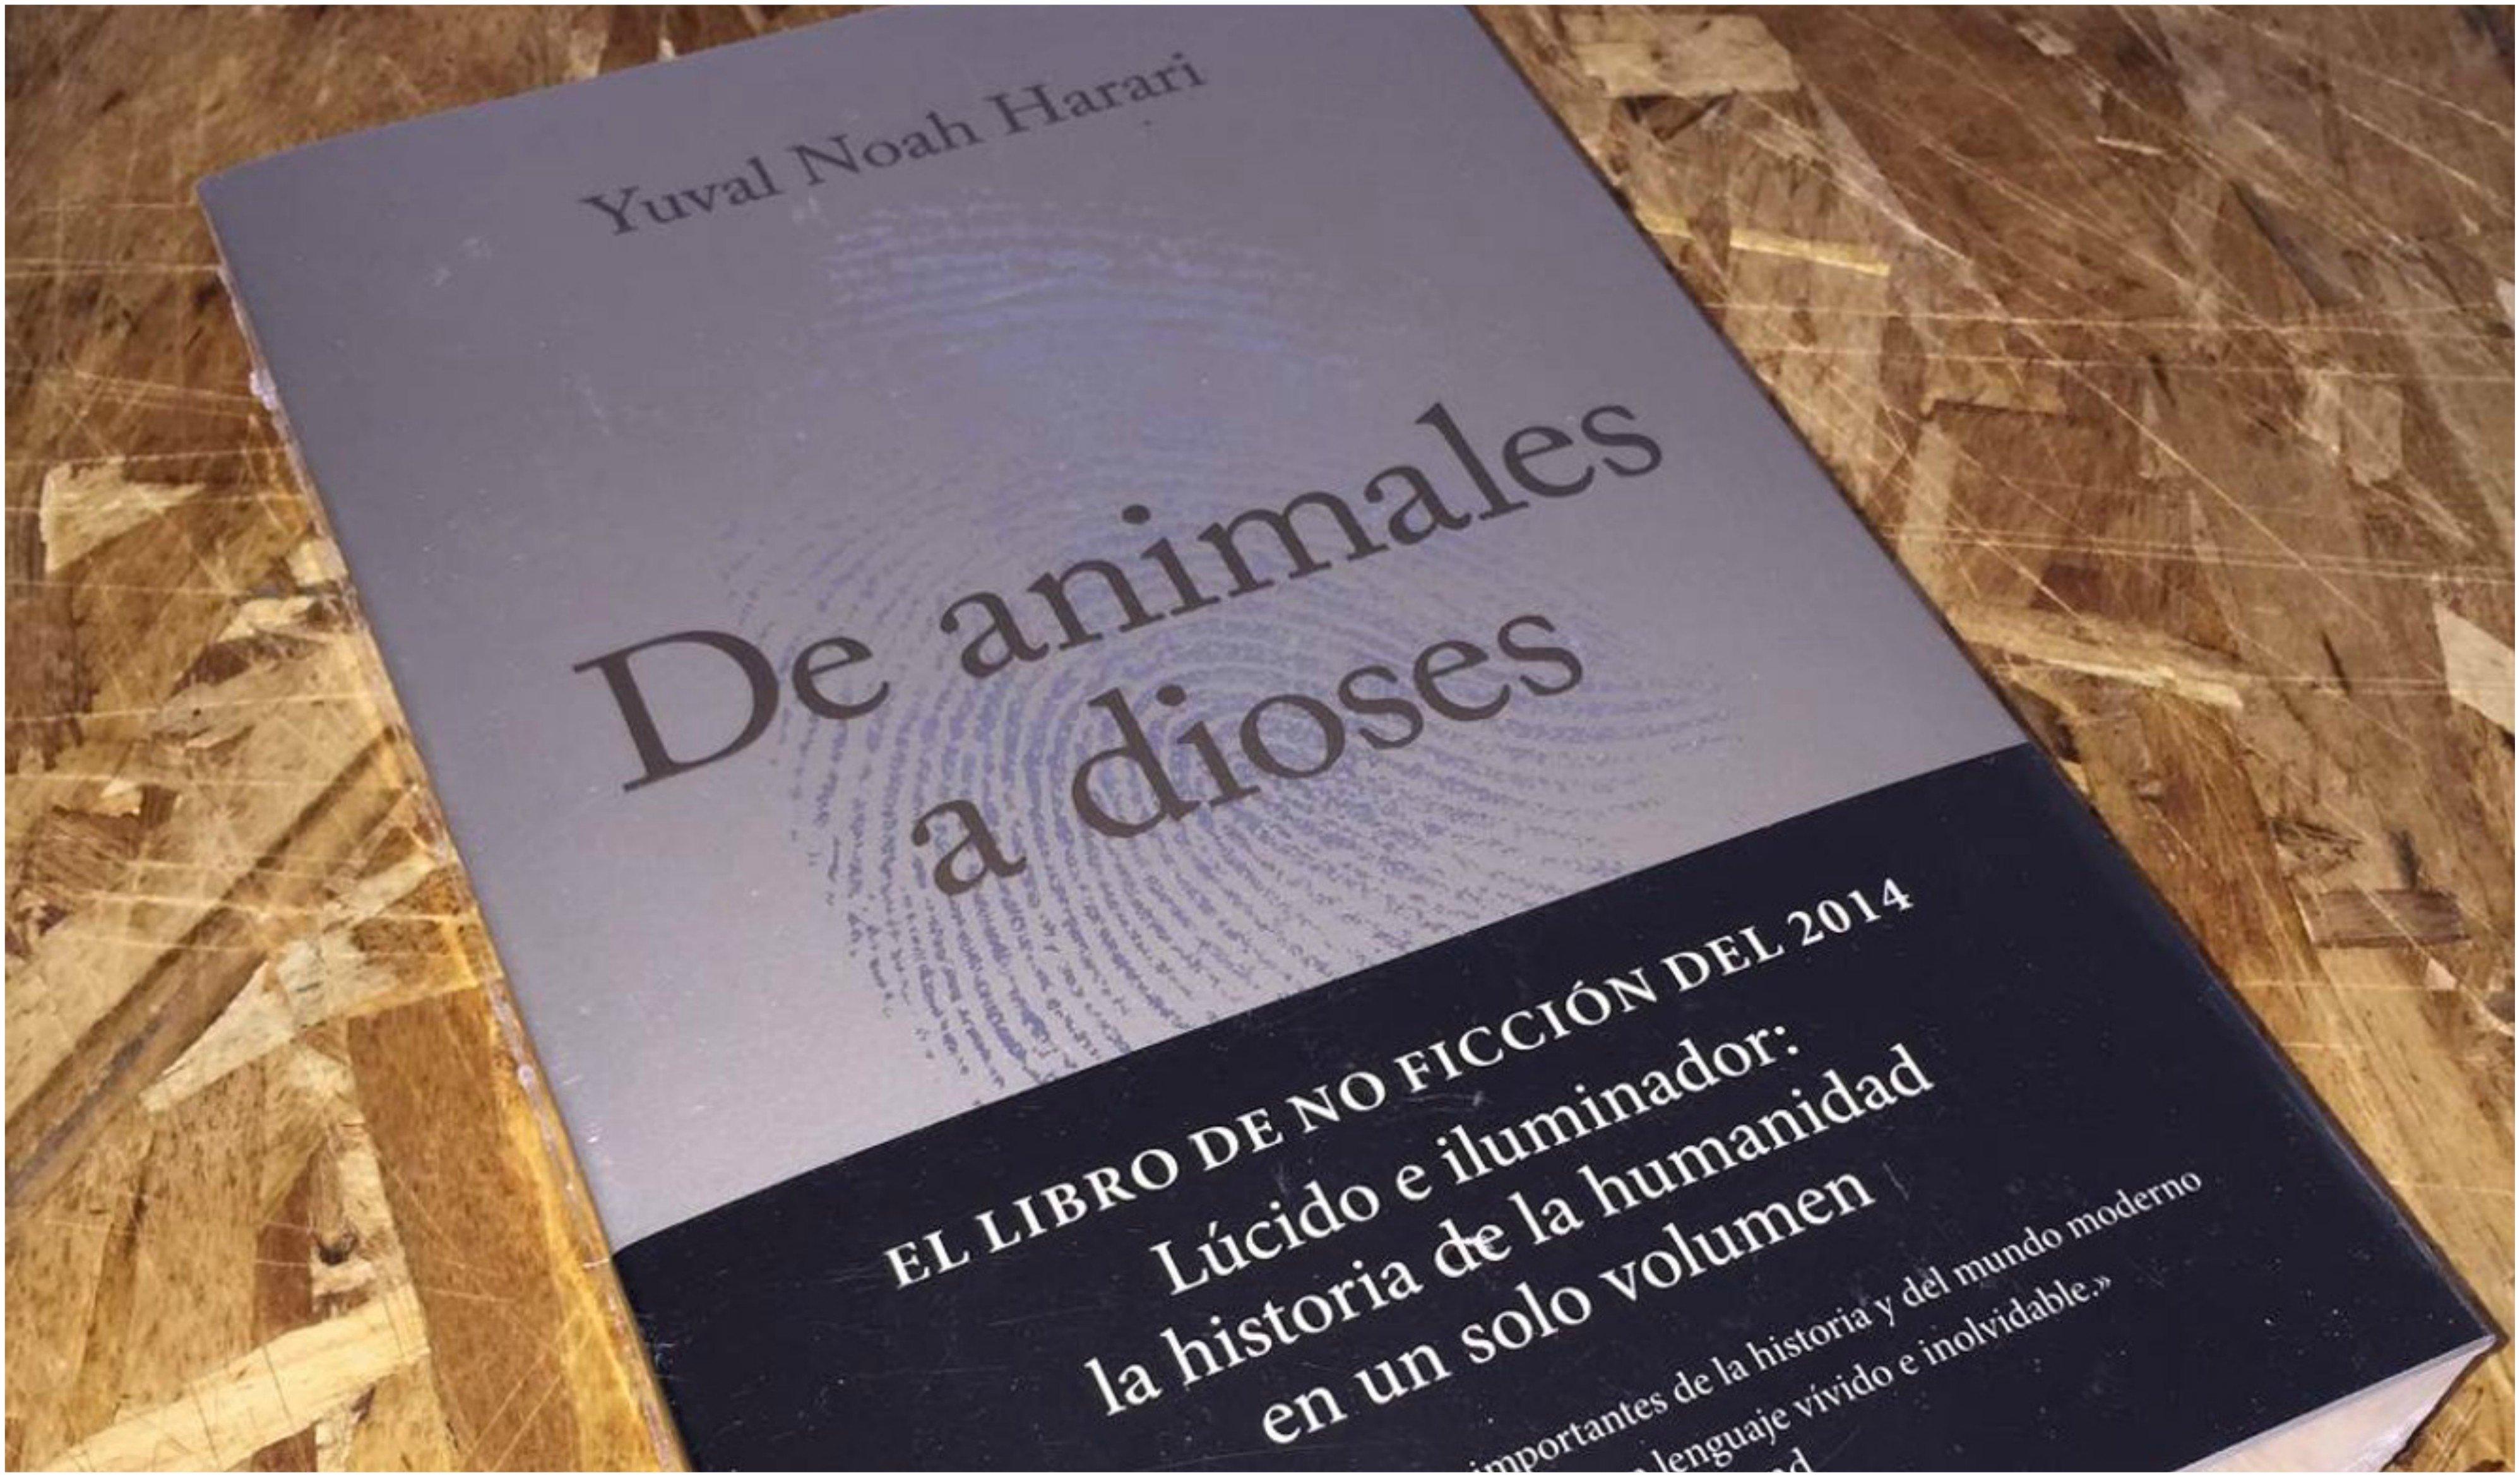 'De animales a dioses'